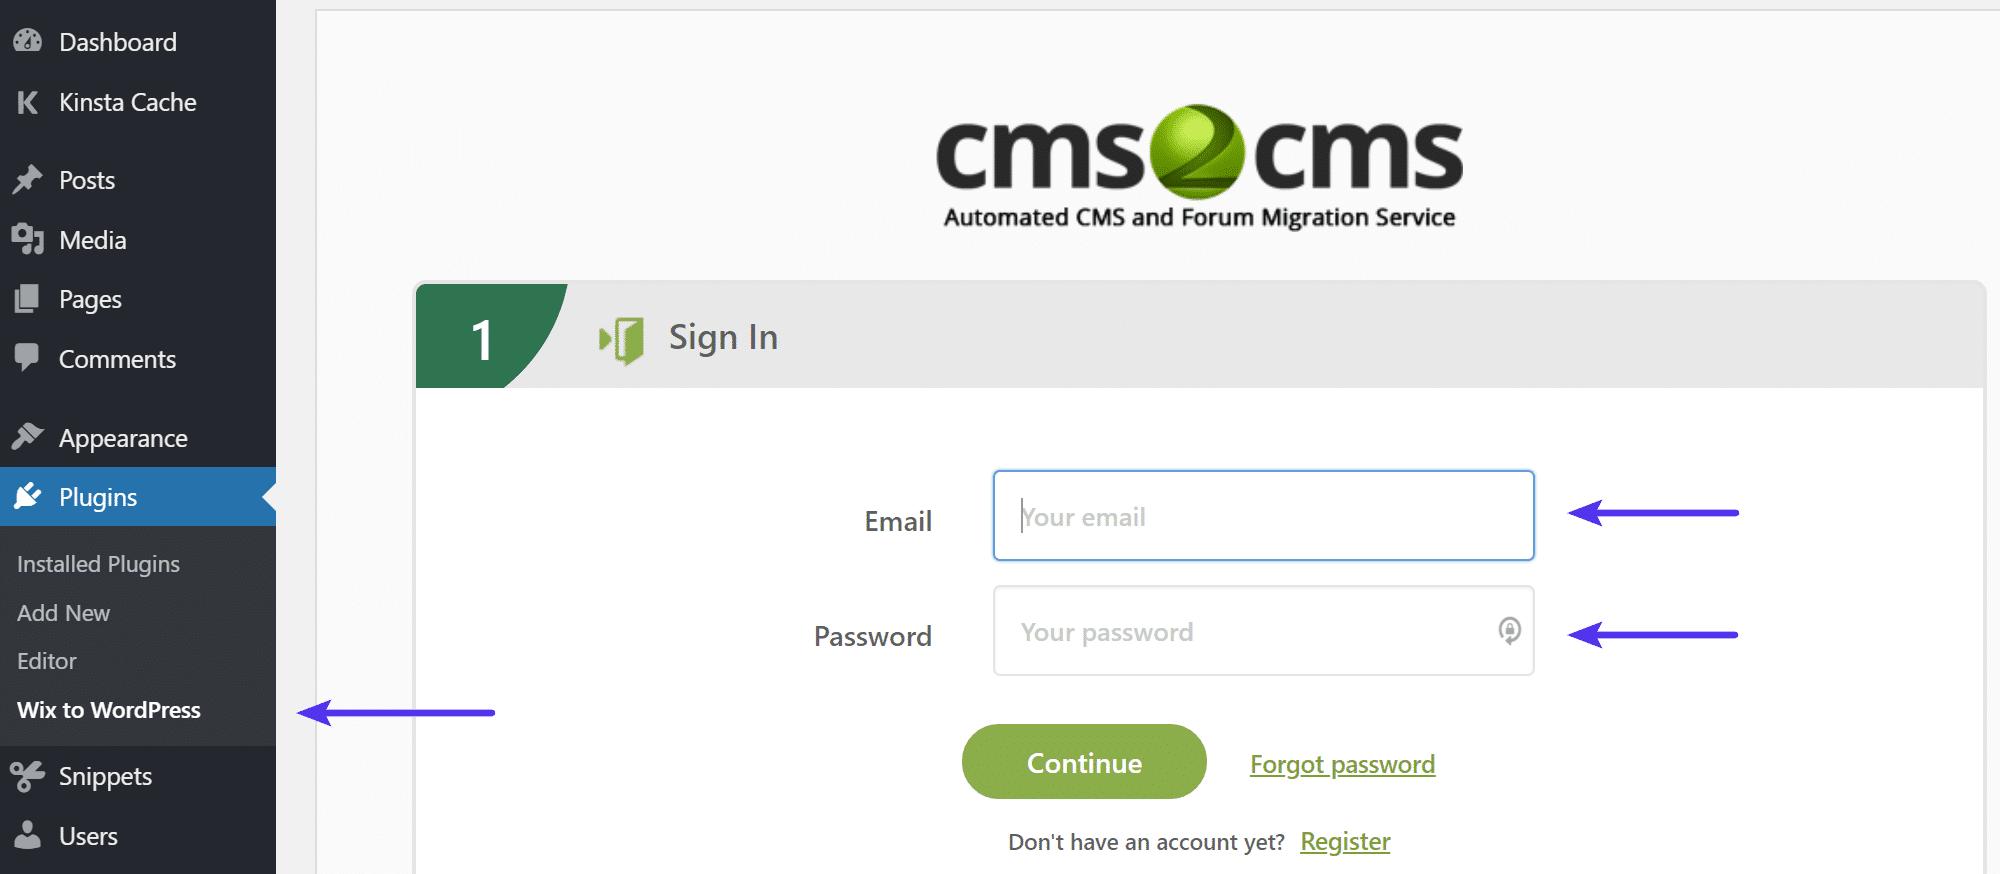 Ouvrir une session CMS2CMS